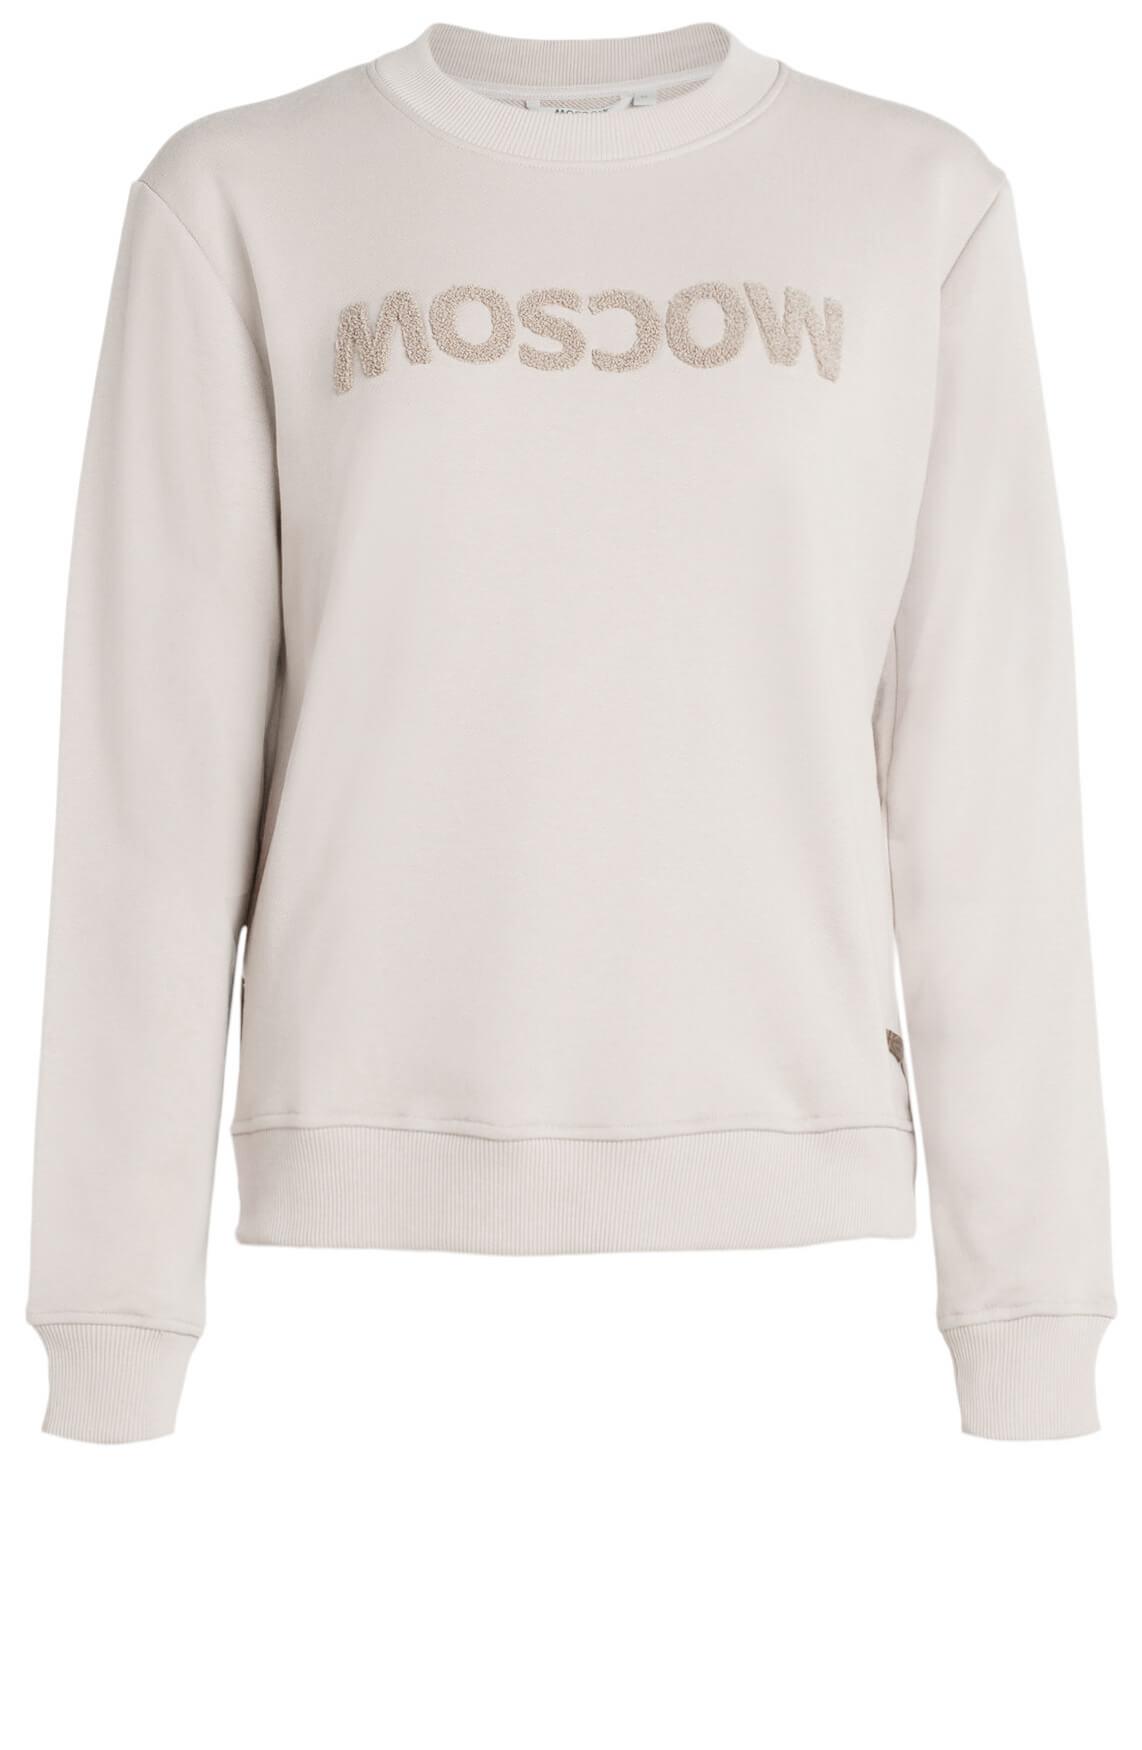 Moscow Dames Sweater met logo opdruk Ecru